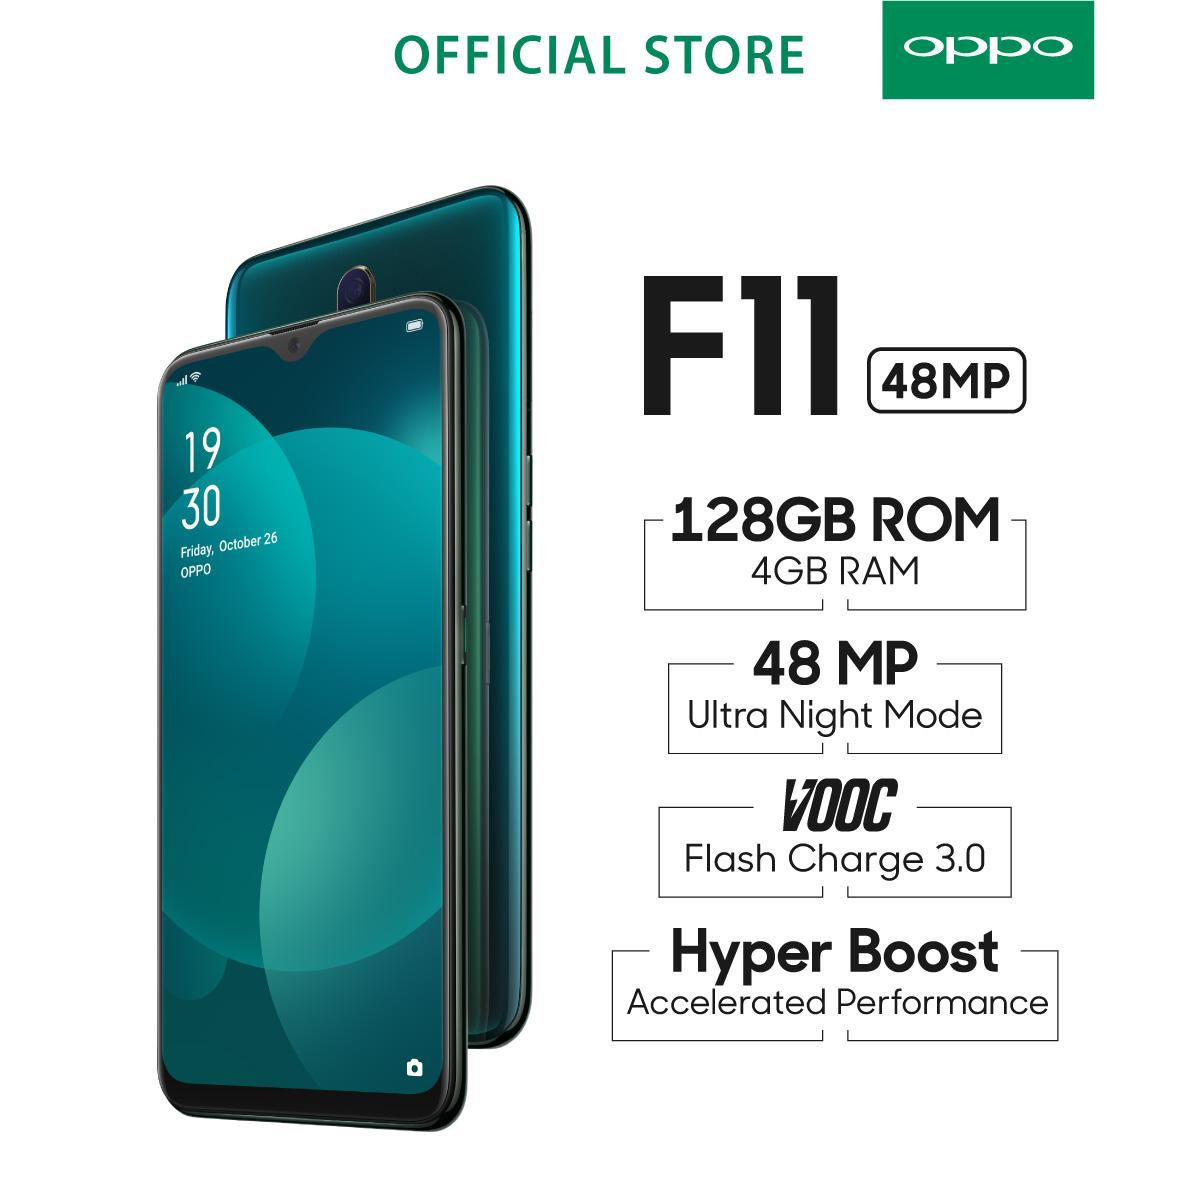 OPPO F11 SMARTPHONE 4 GB / 128 GB 48 MP Ultra Night Mode Camera